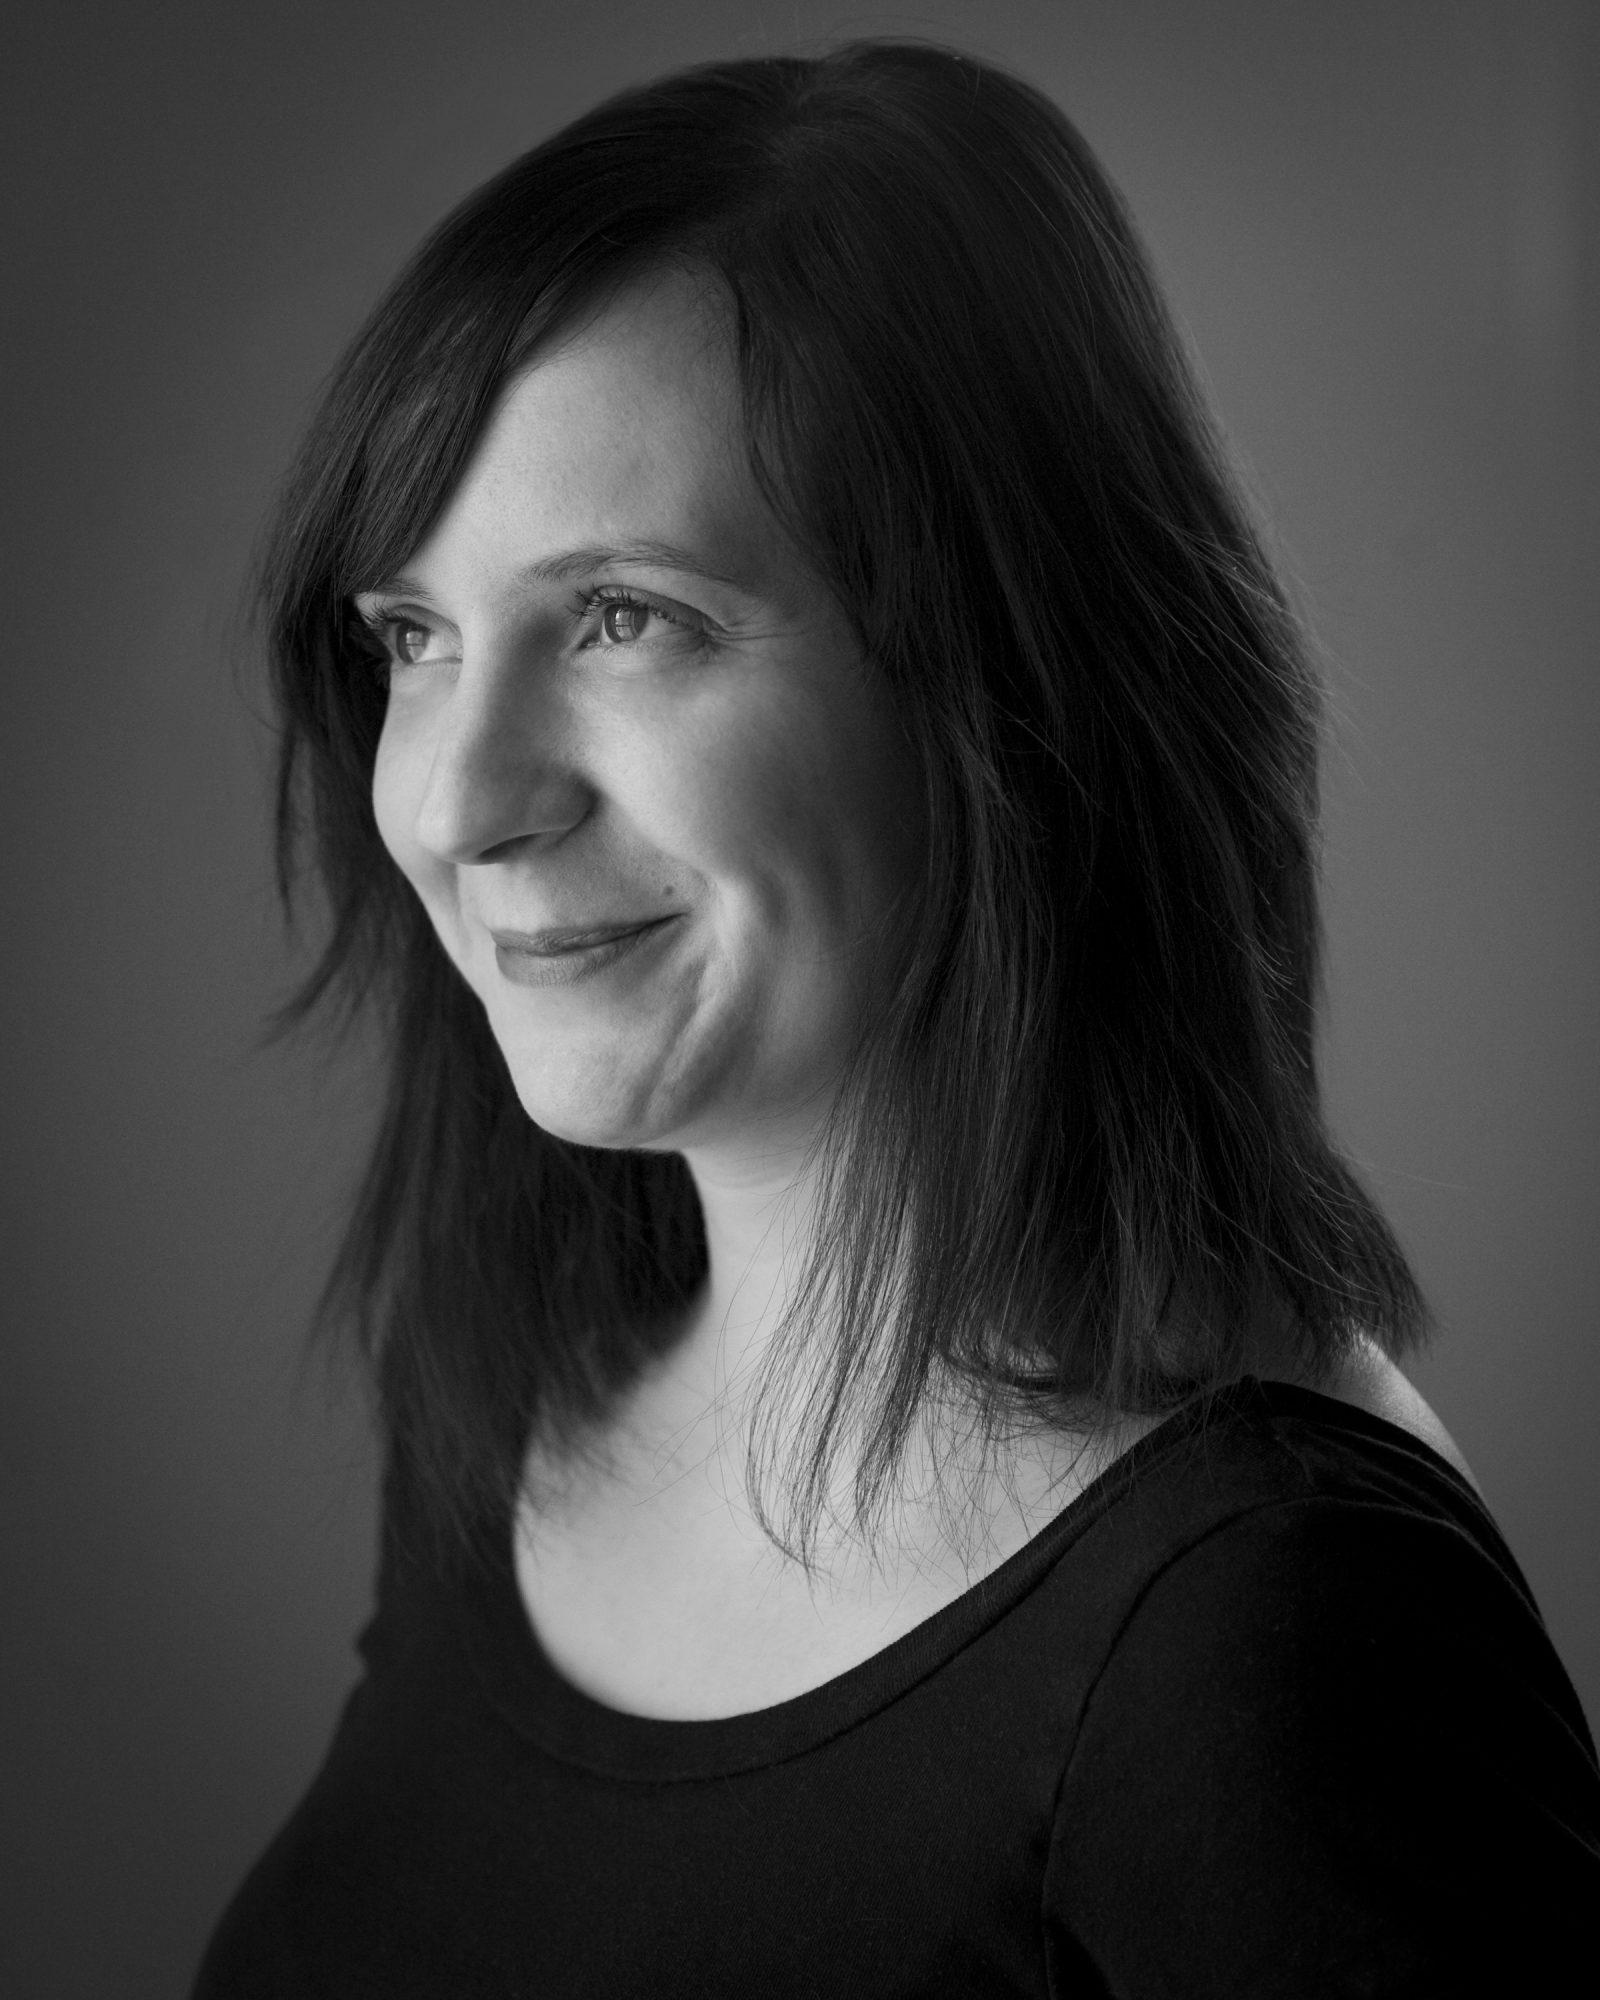 Heidi Malazdrewich